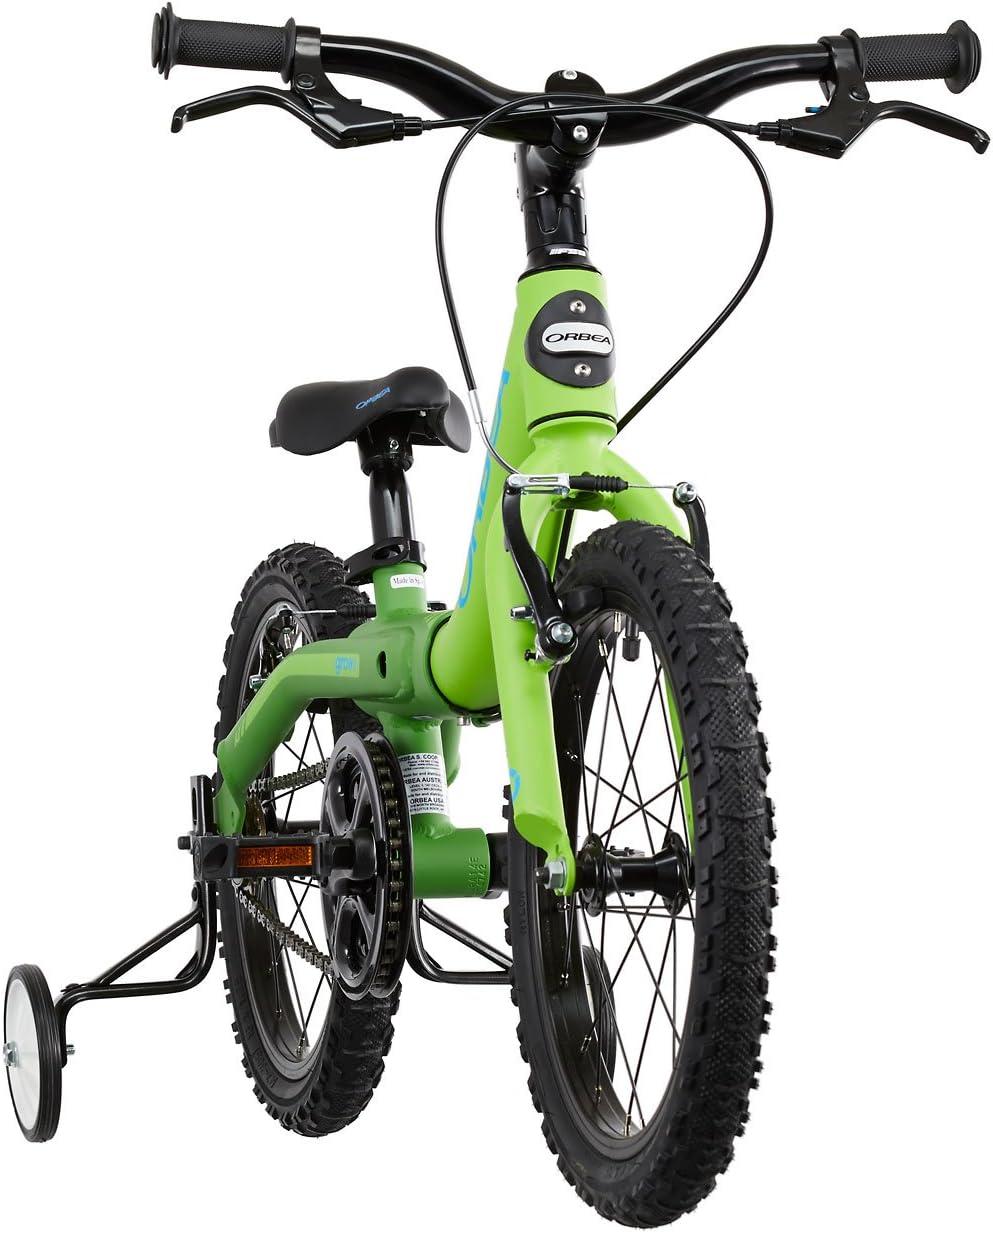 Bicicleta para niños ORBEA Grow 1 16 pulgadas verde 2015: Amazon ...